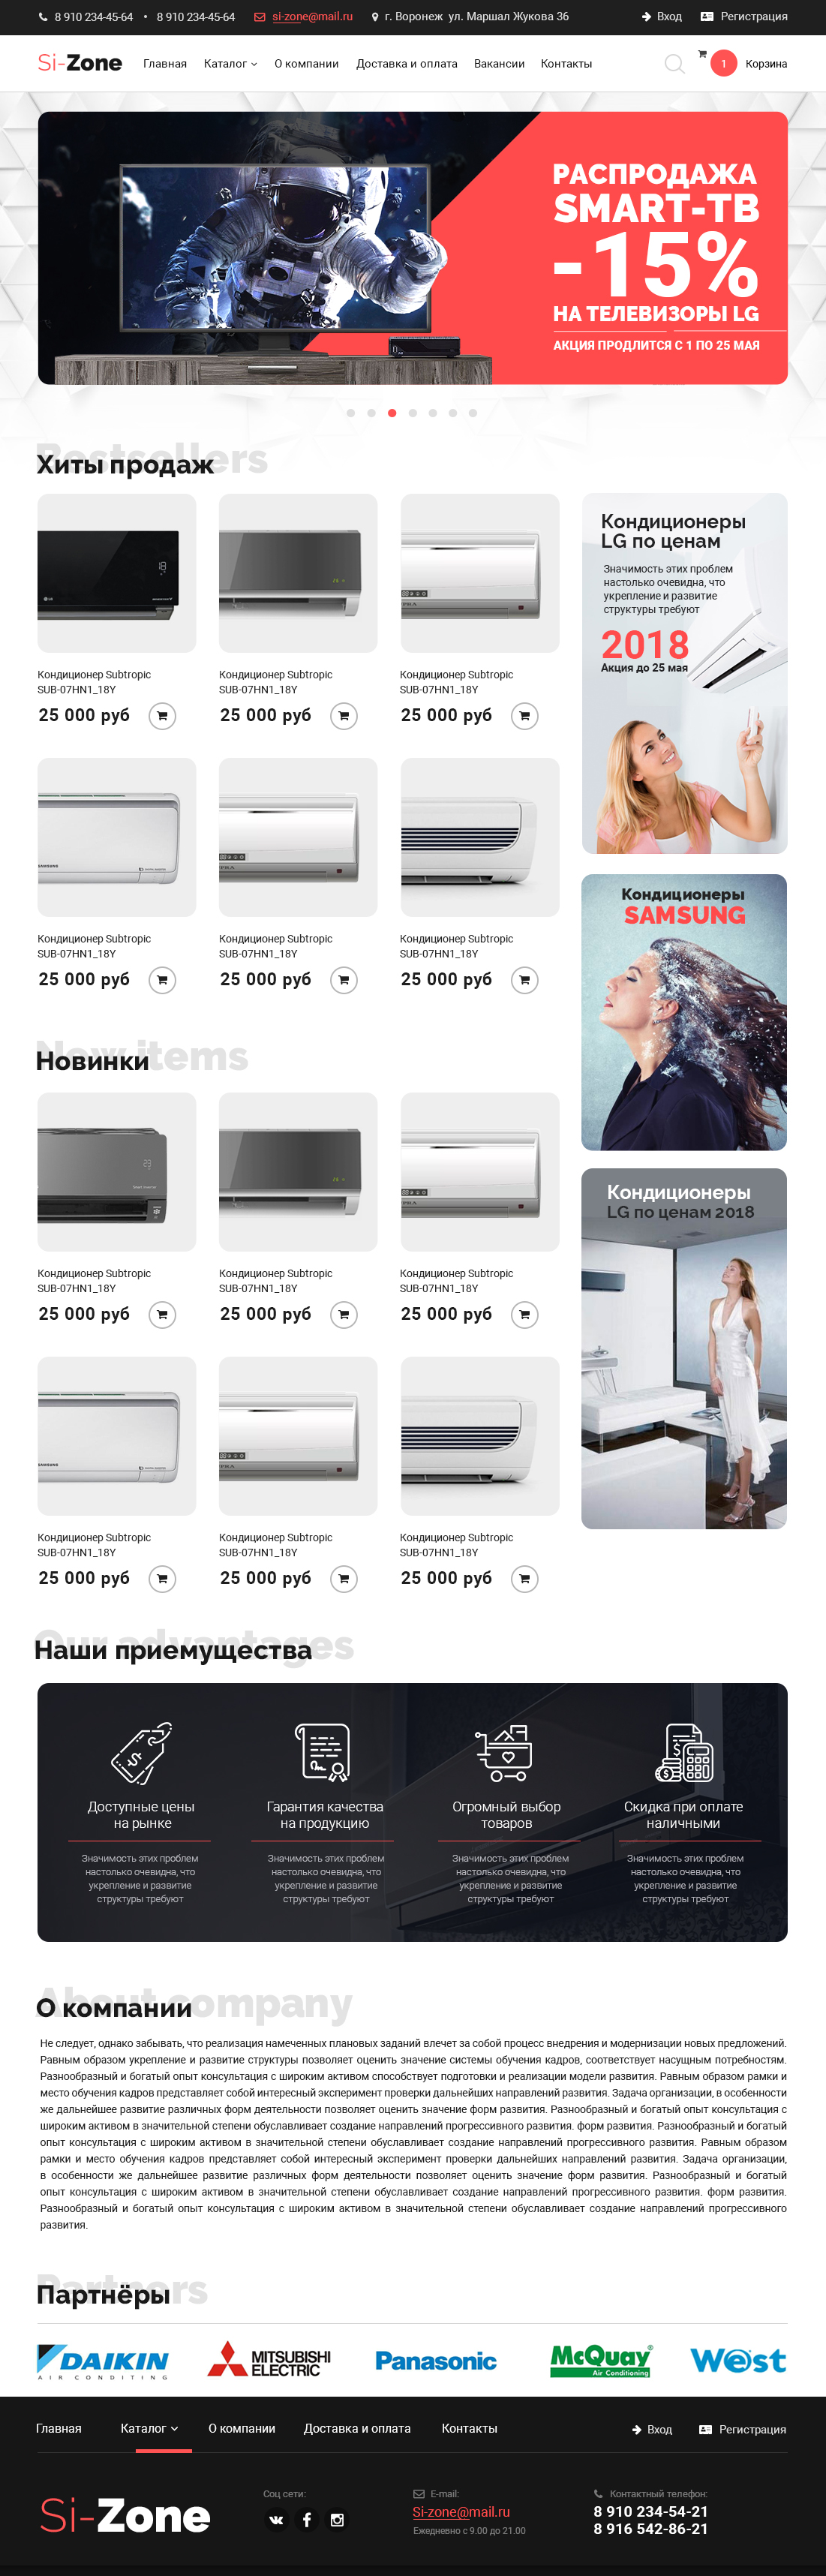 ООО «СМК» 1000 px